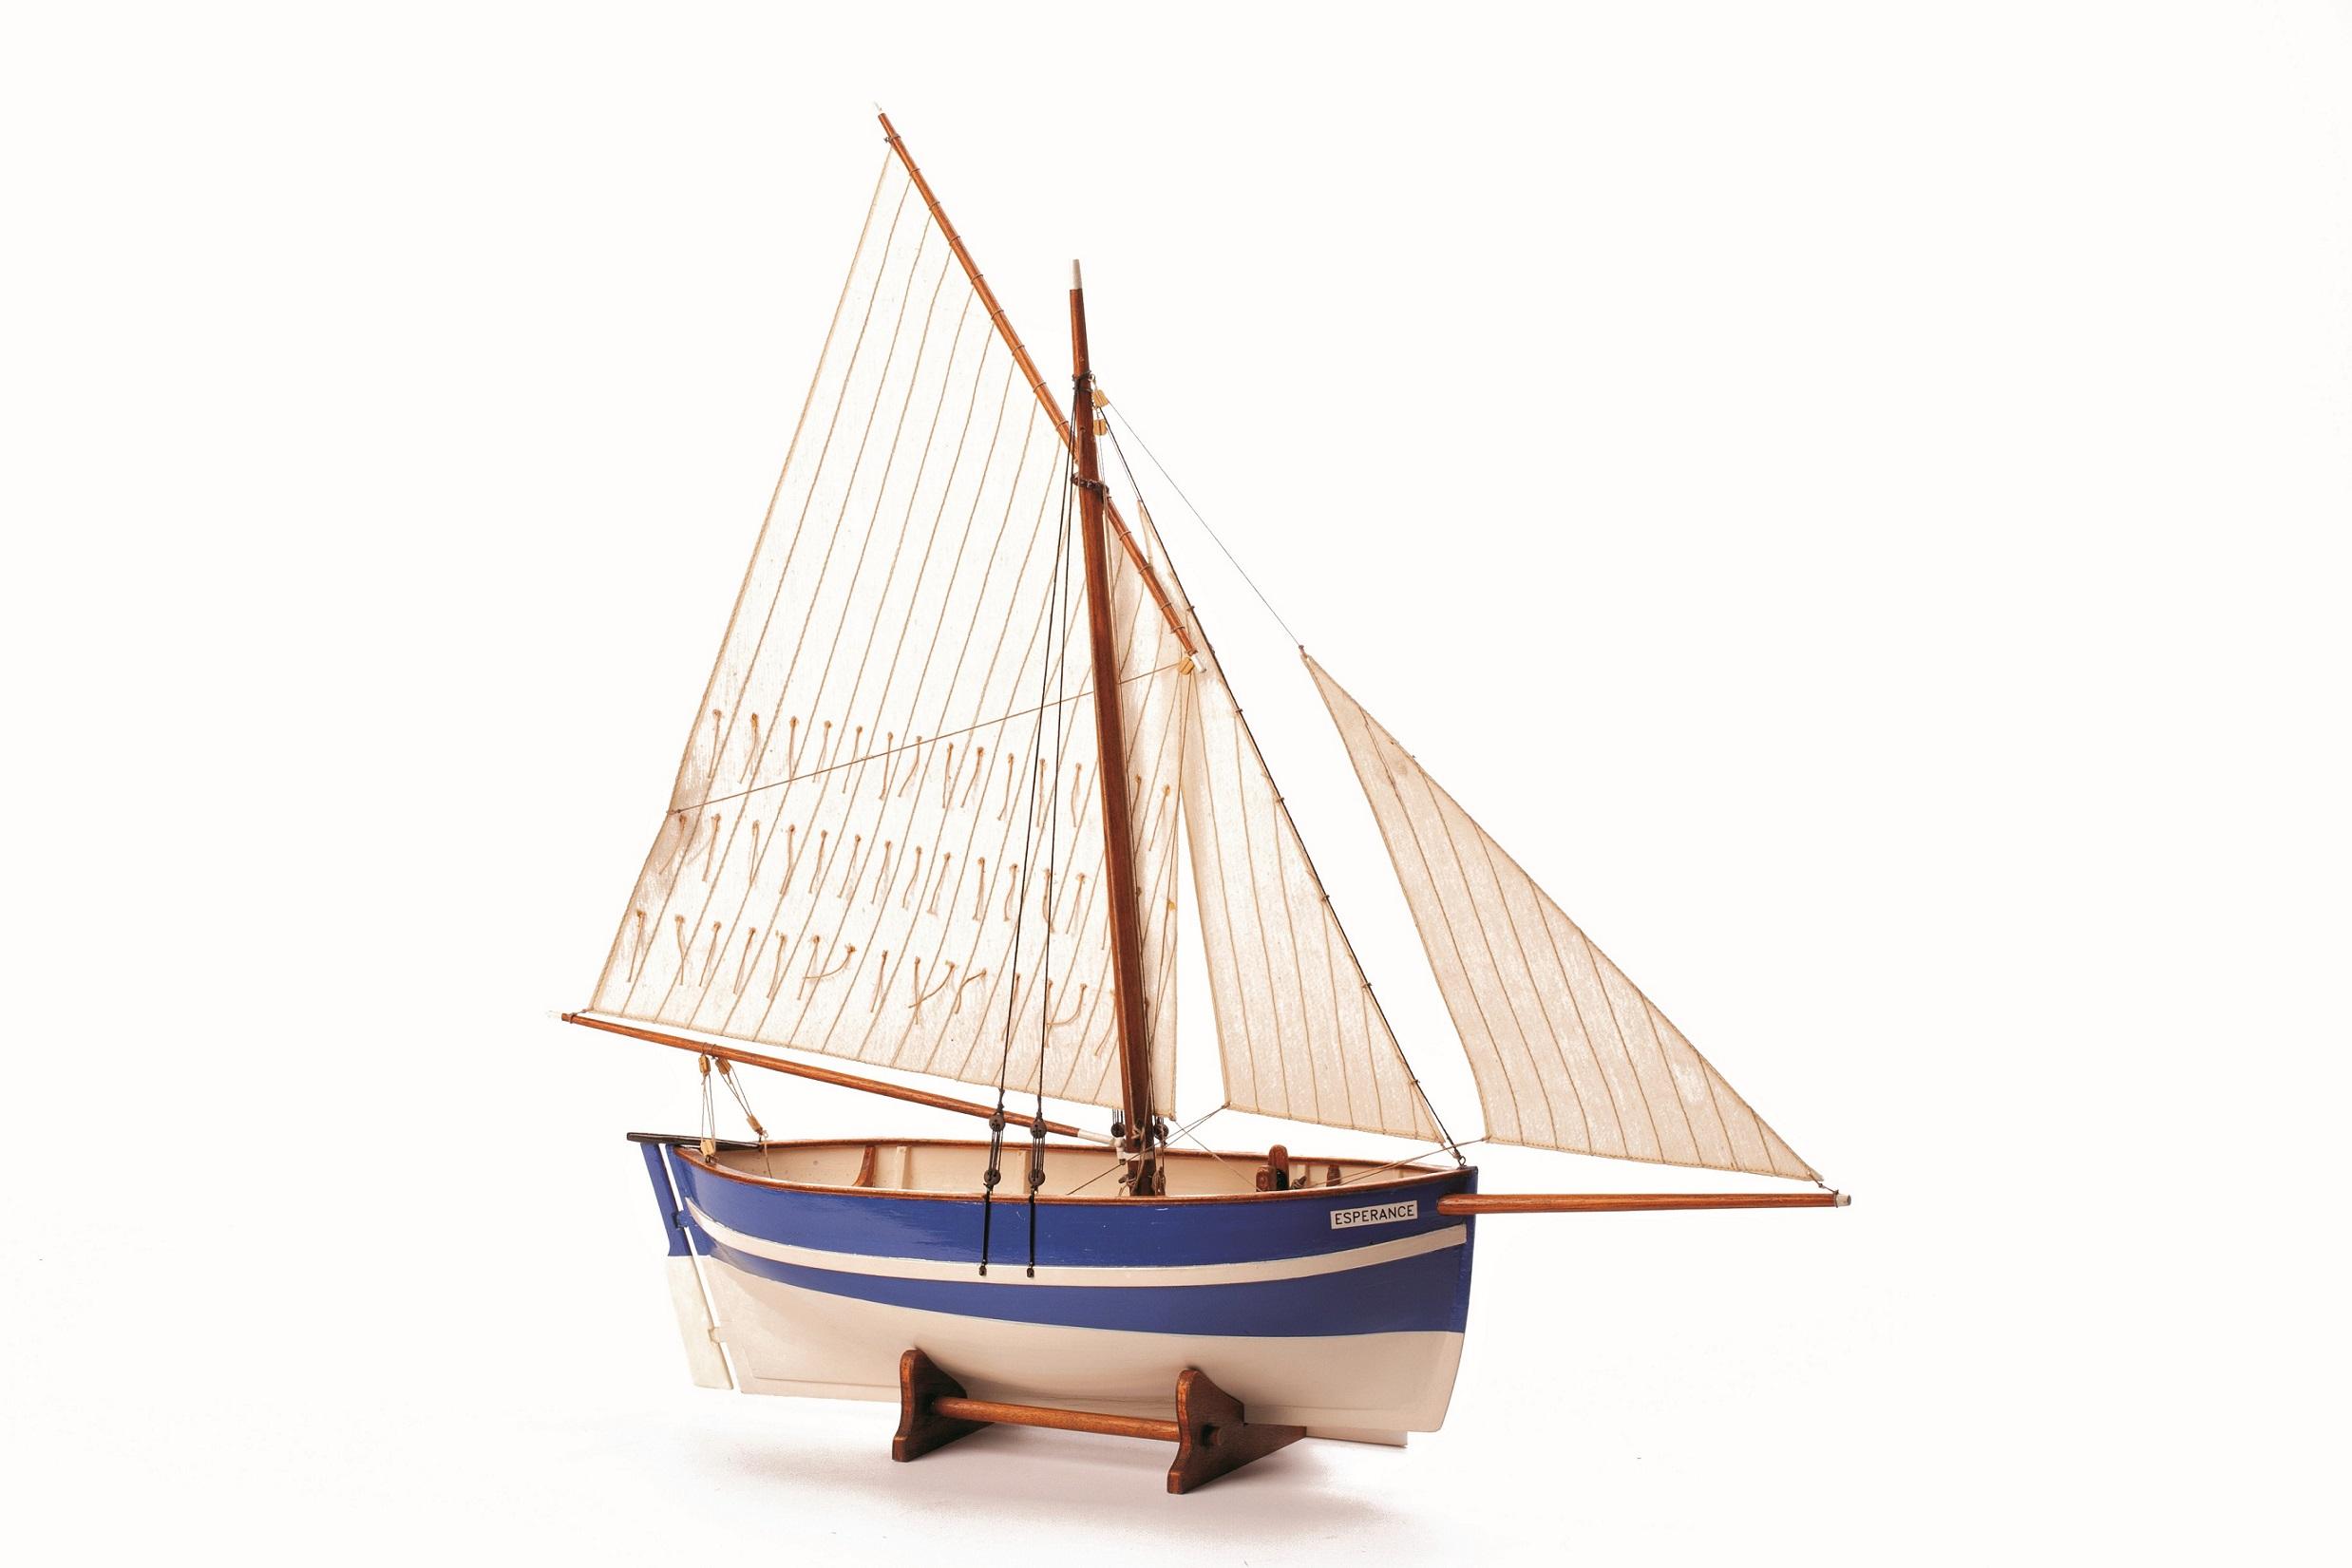 Billing Boats 319 x 95 mm Lifeboat for Model Building Kit